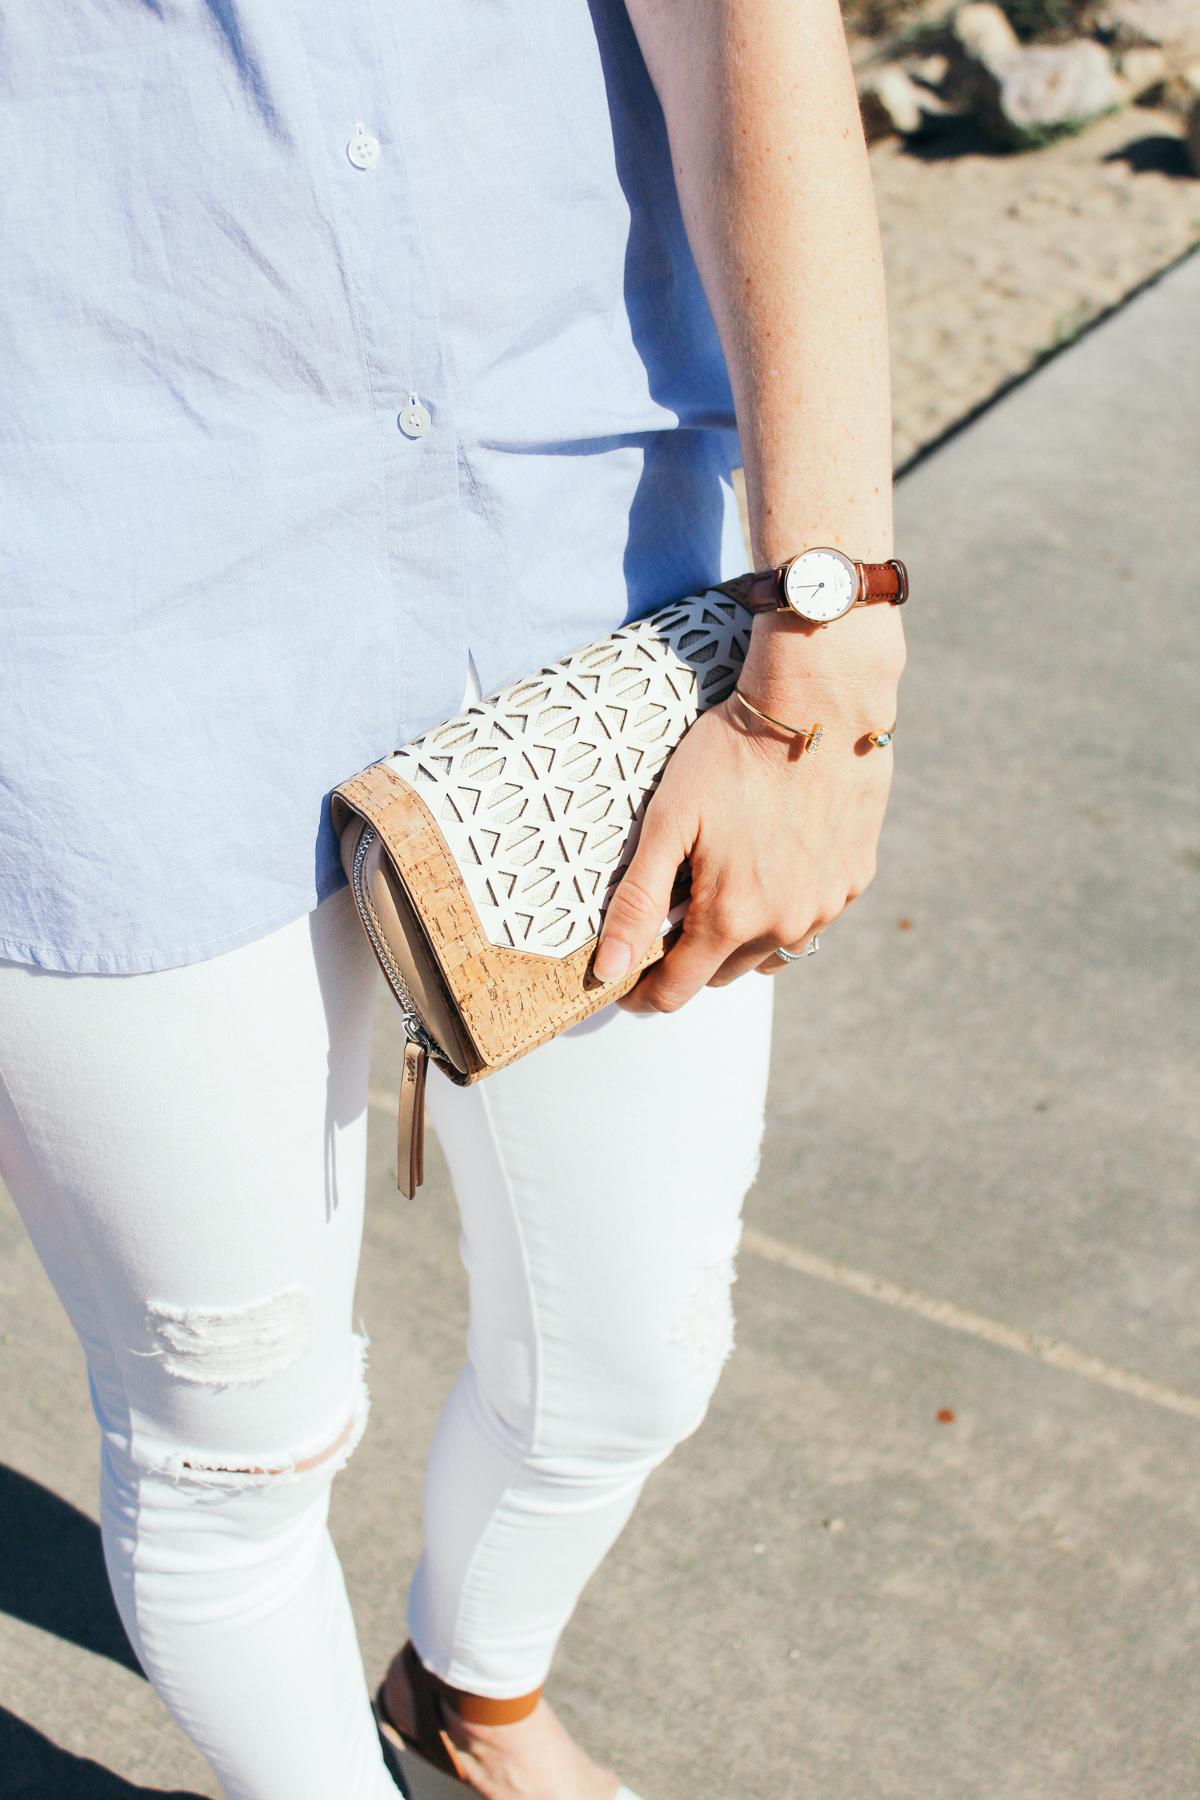 stella dot cork clutch, daniel wellington watch, jules smith cuff, white distressed denim